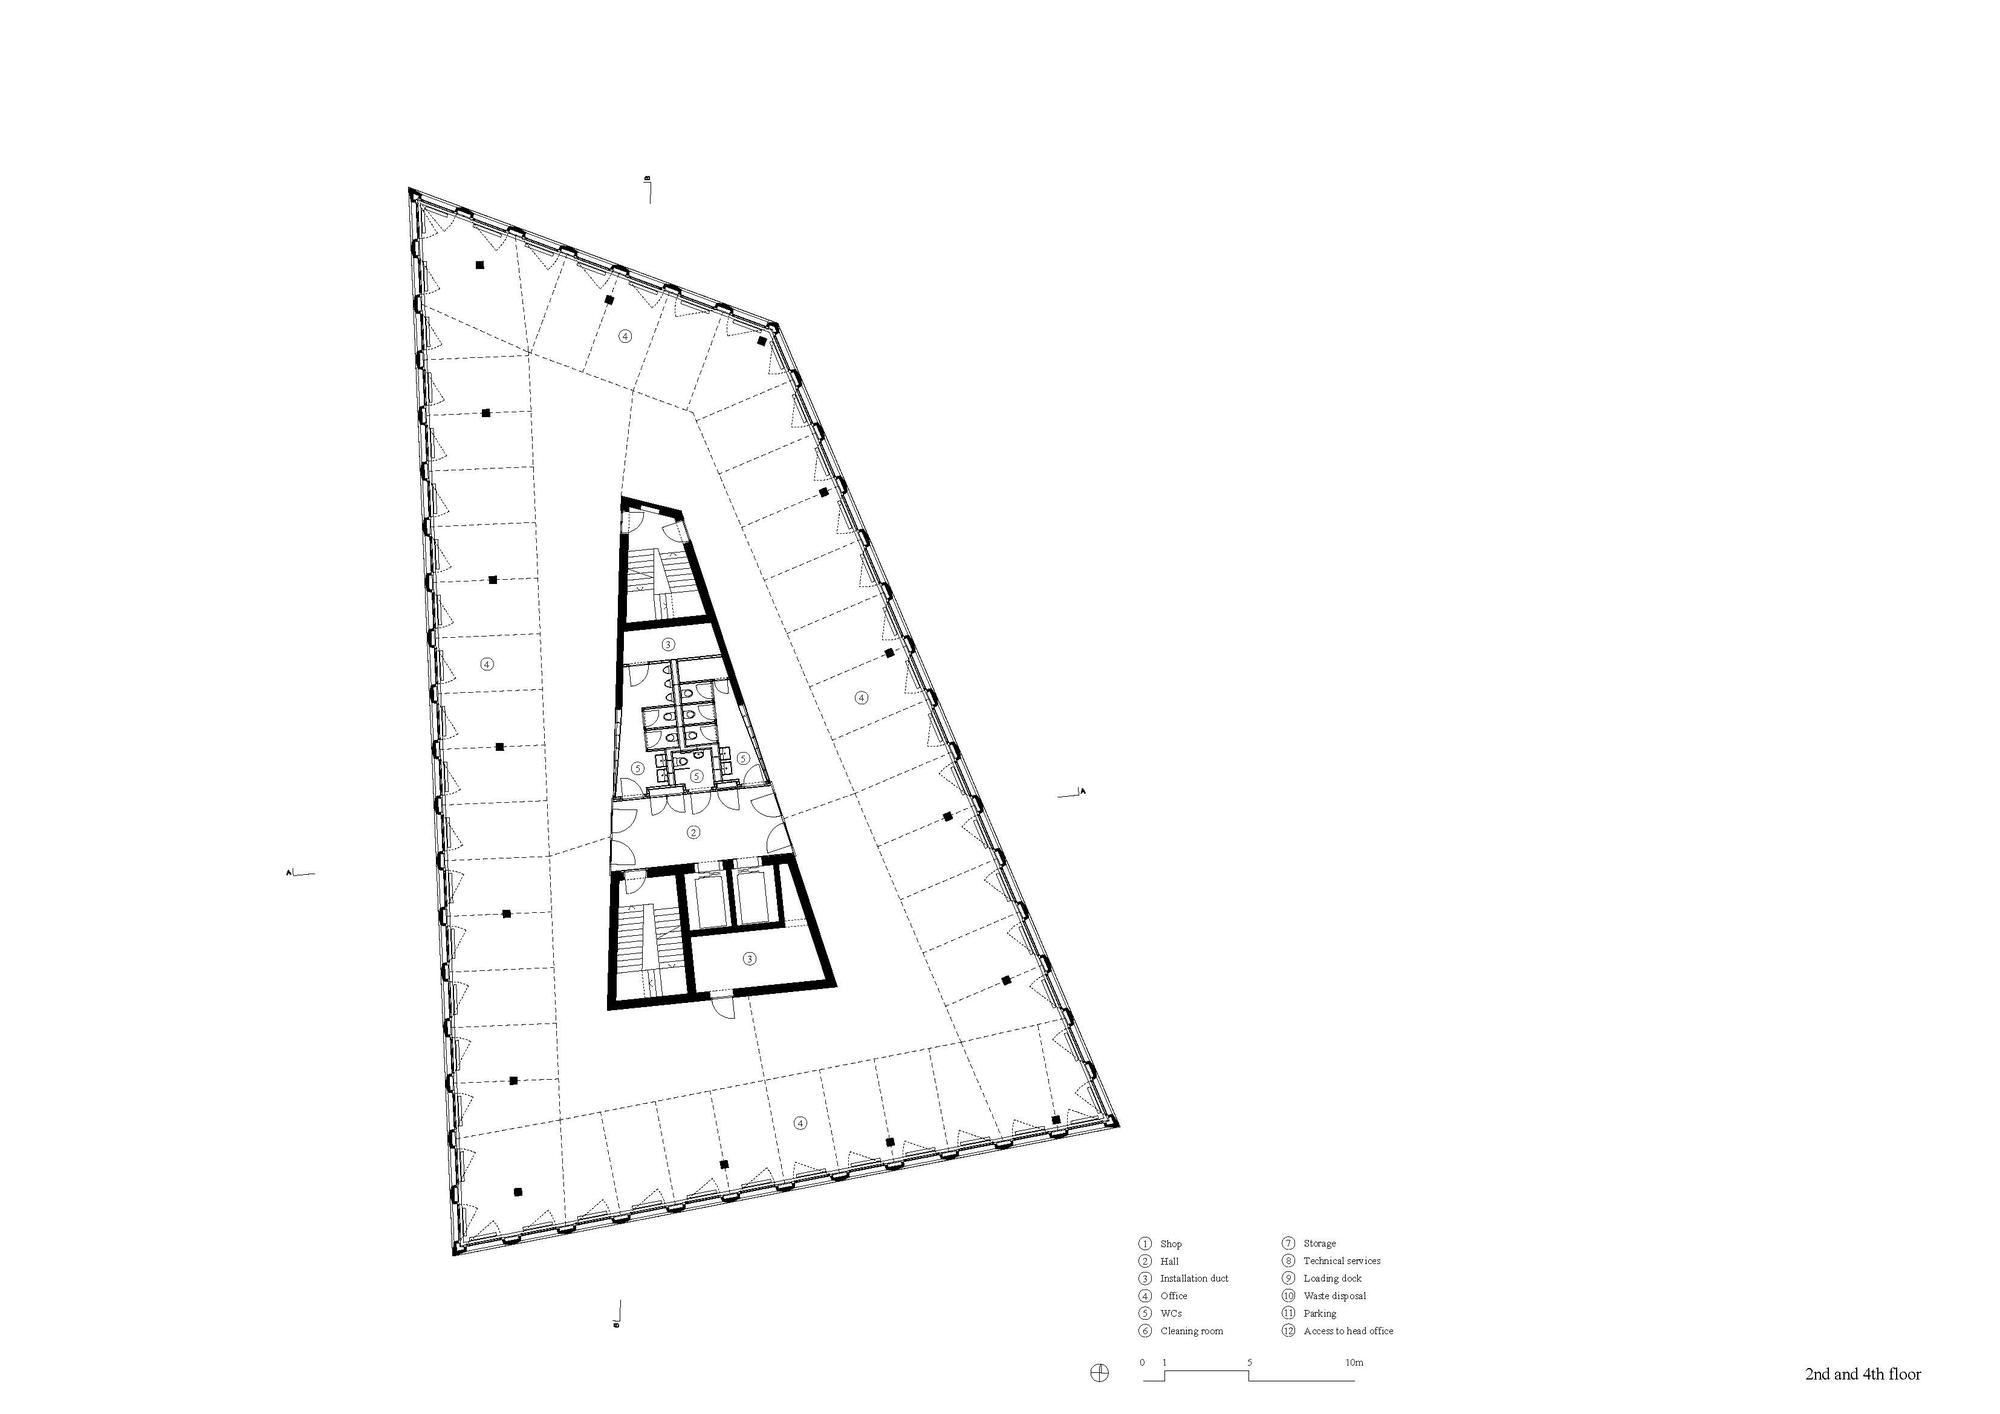 Triangular Floor Plan Gallery Of Office Building In Liestal Christ